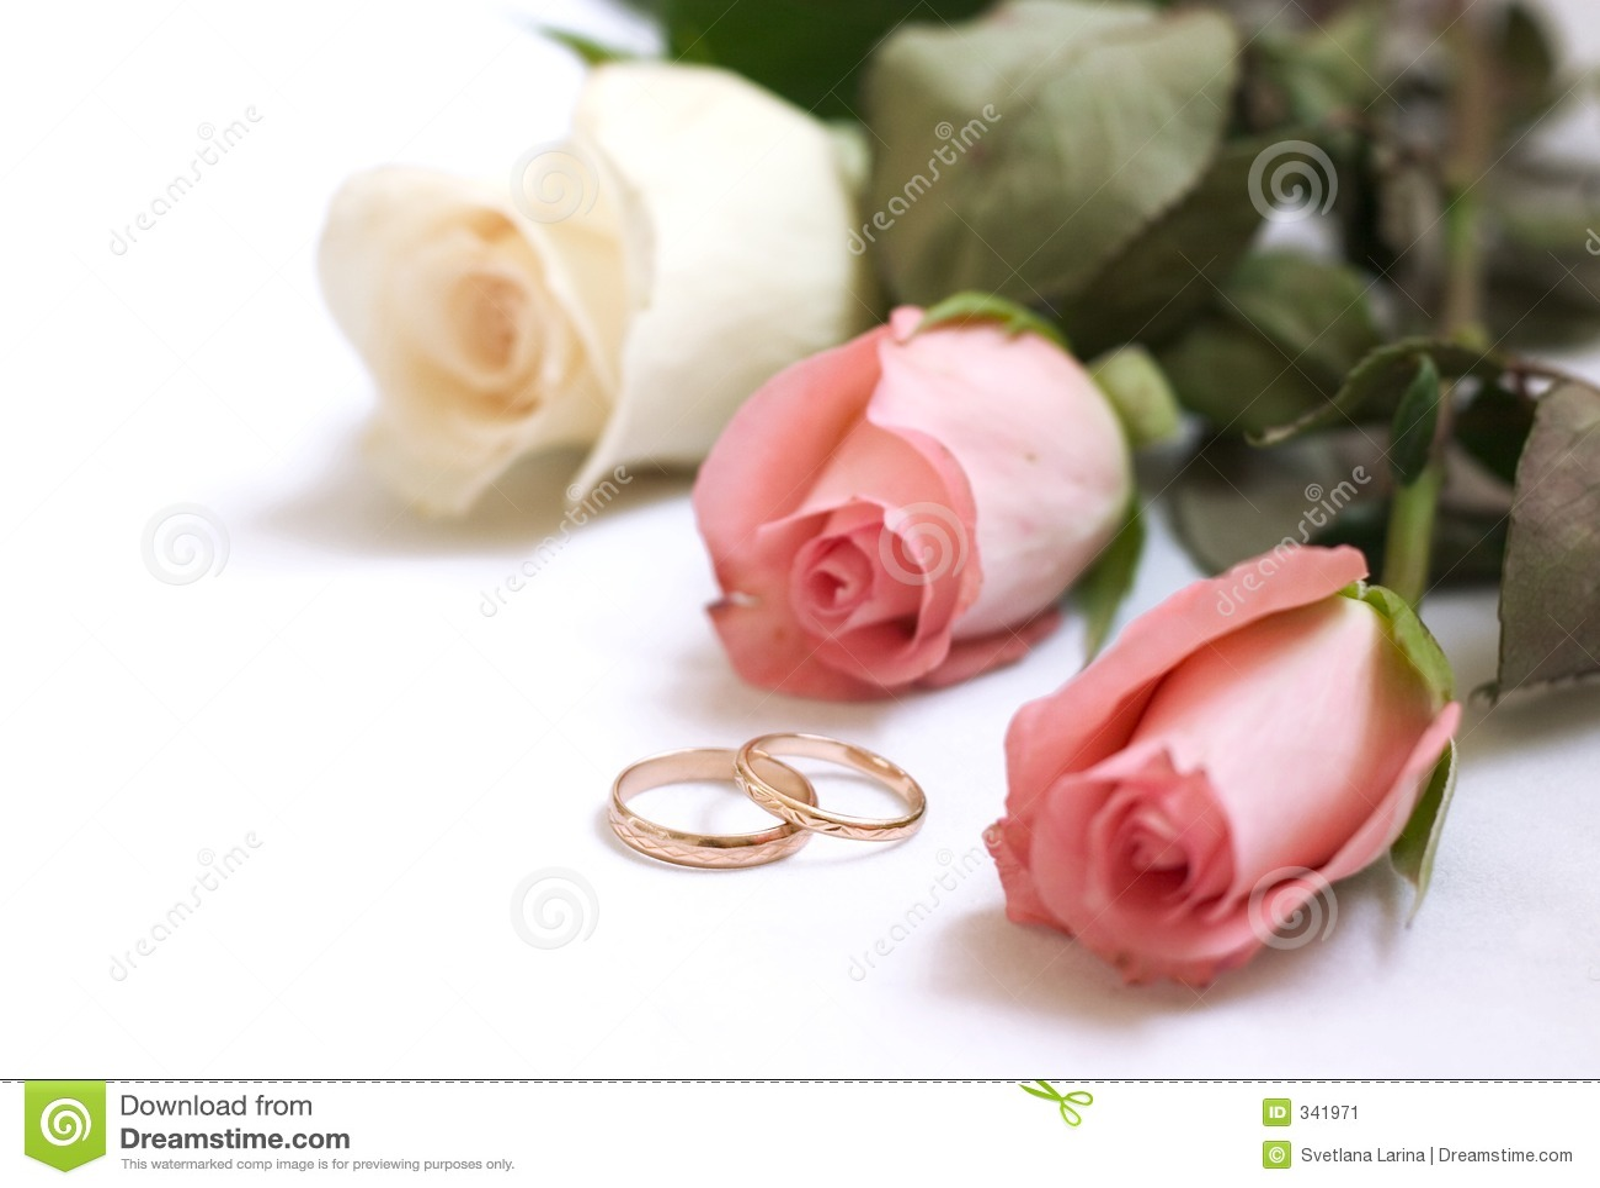 carte d 39 invitation de mariage image stock image du bonheur honeymoon 341971. Black Bedroom Furniture Sets. Home Design Ideas